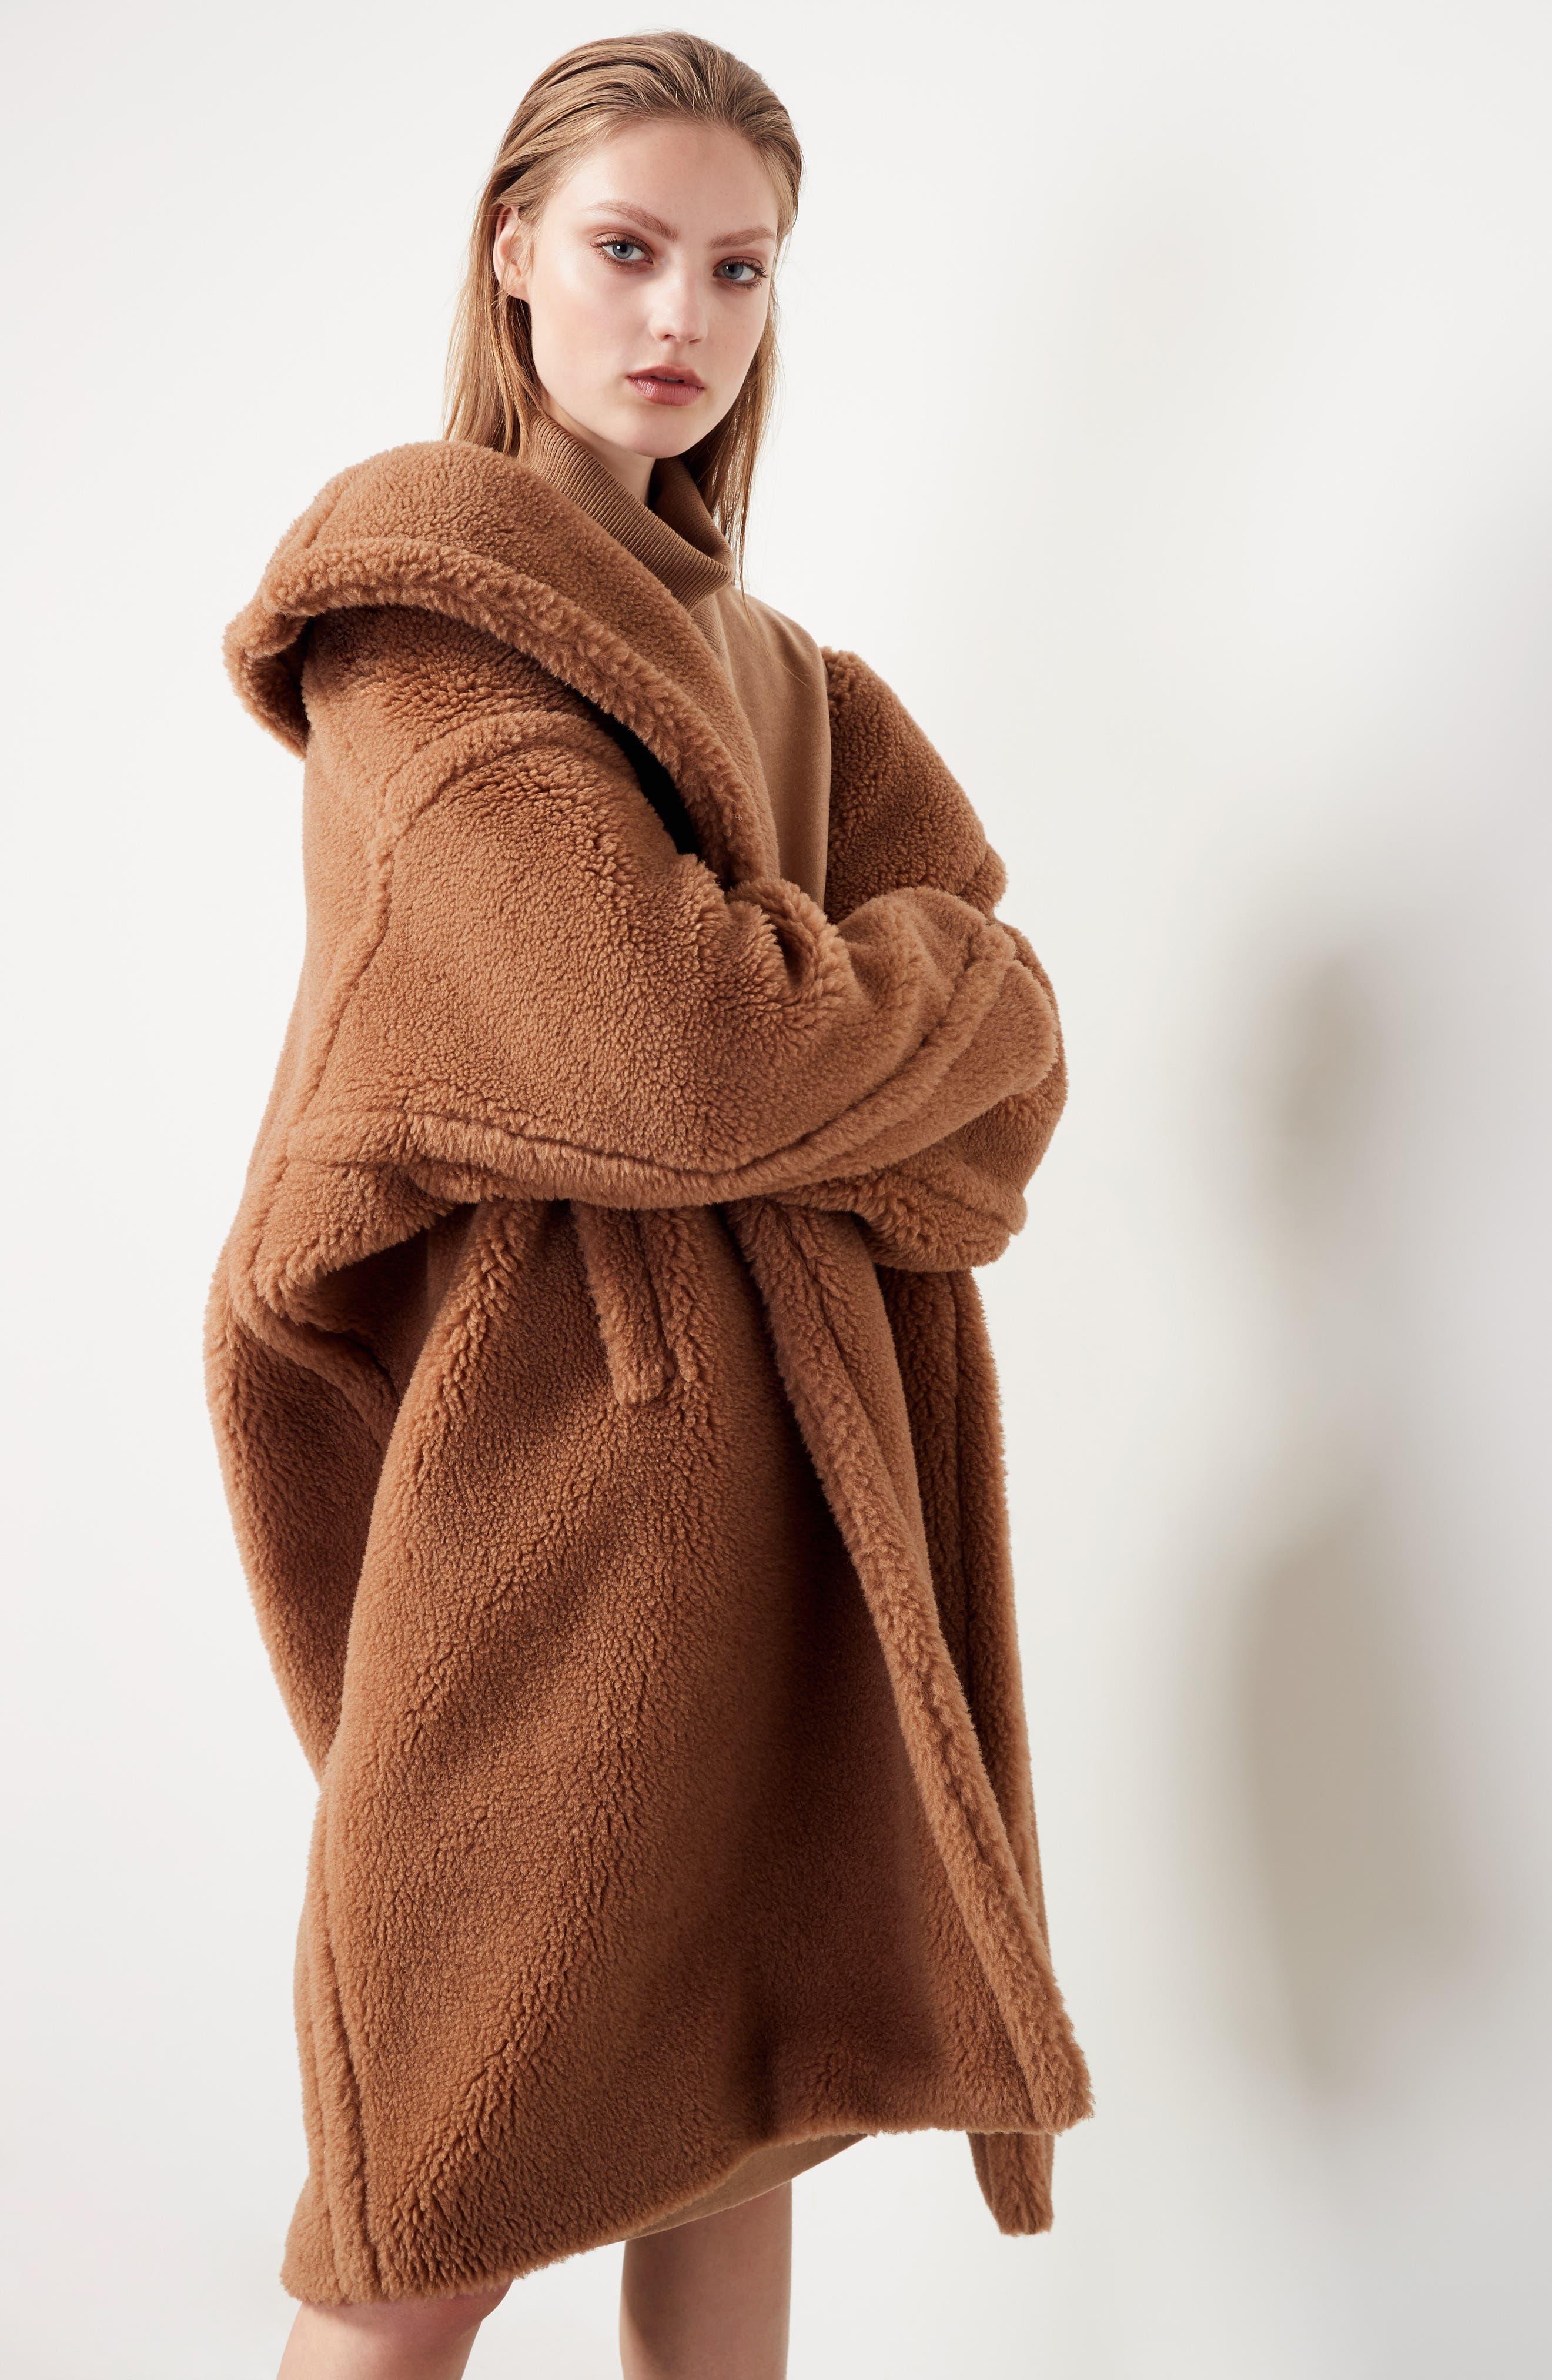 Agro Wool Turtleneck Dress,                             Alternate thumbnail 6, color,                             232